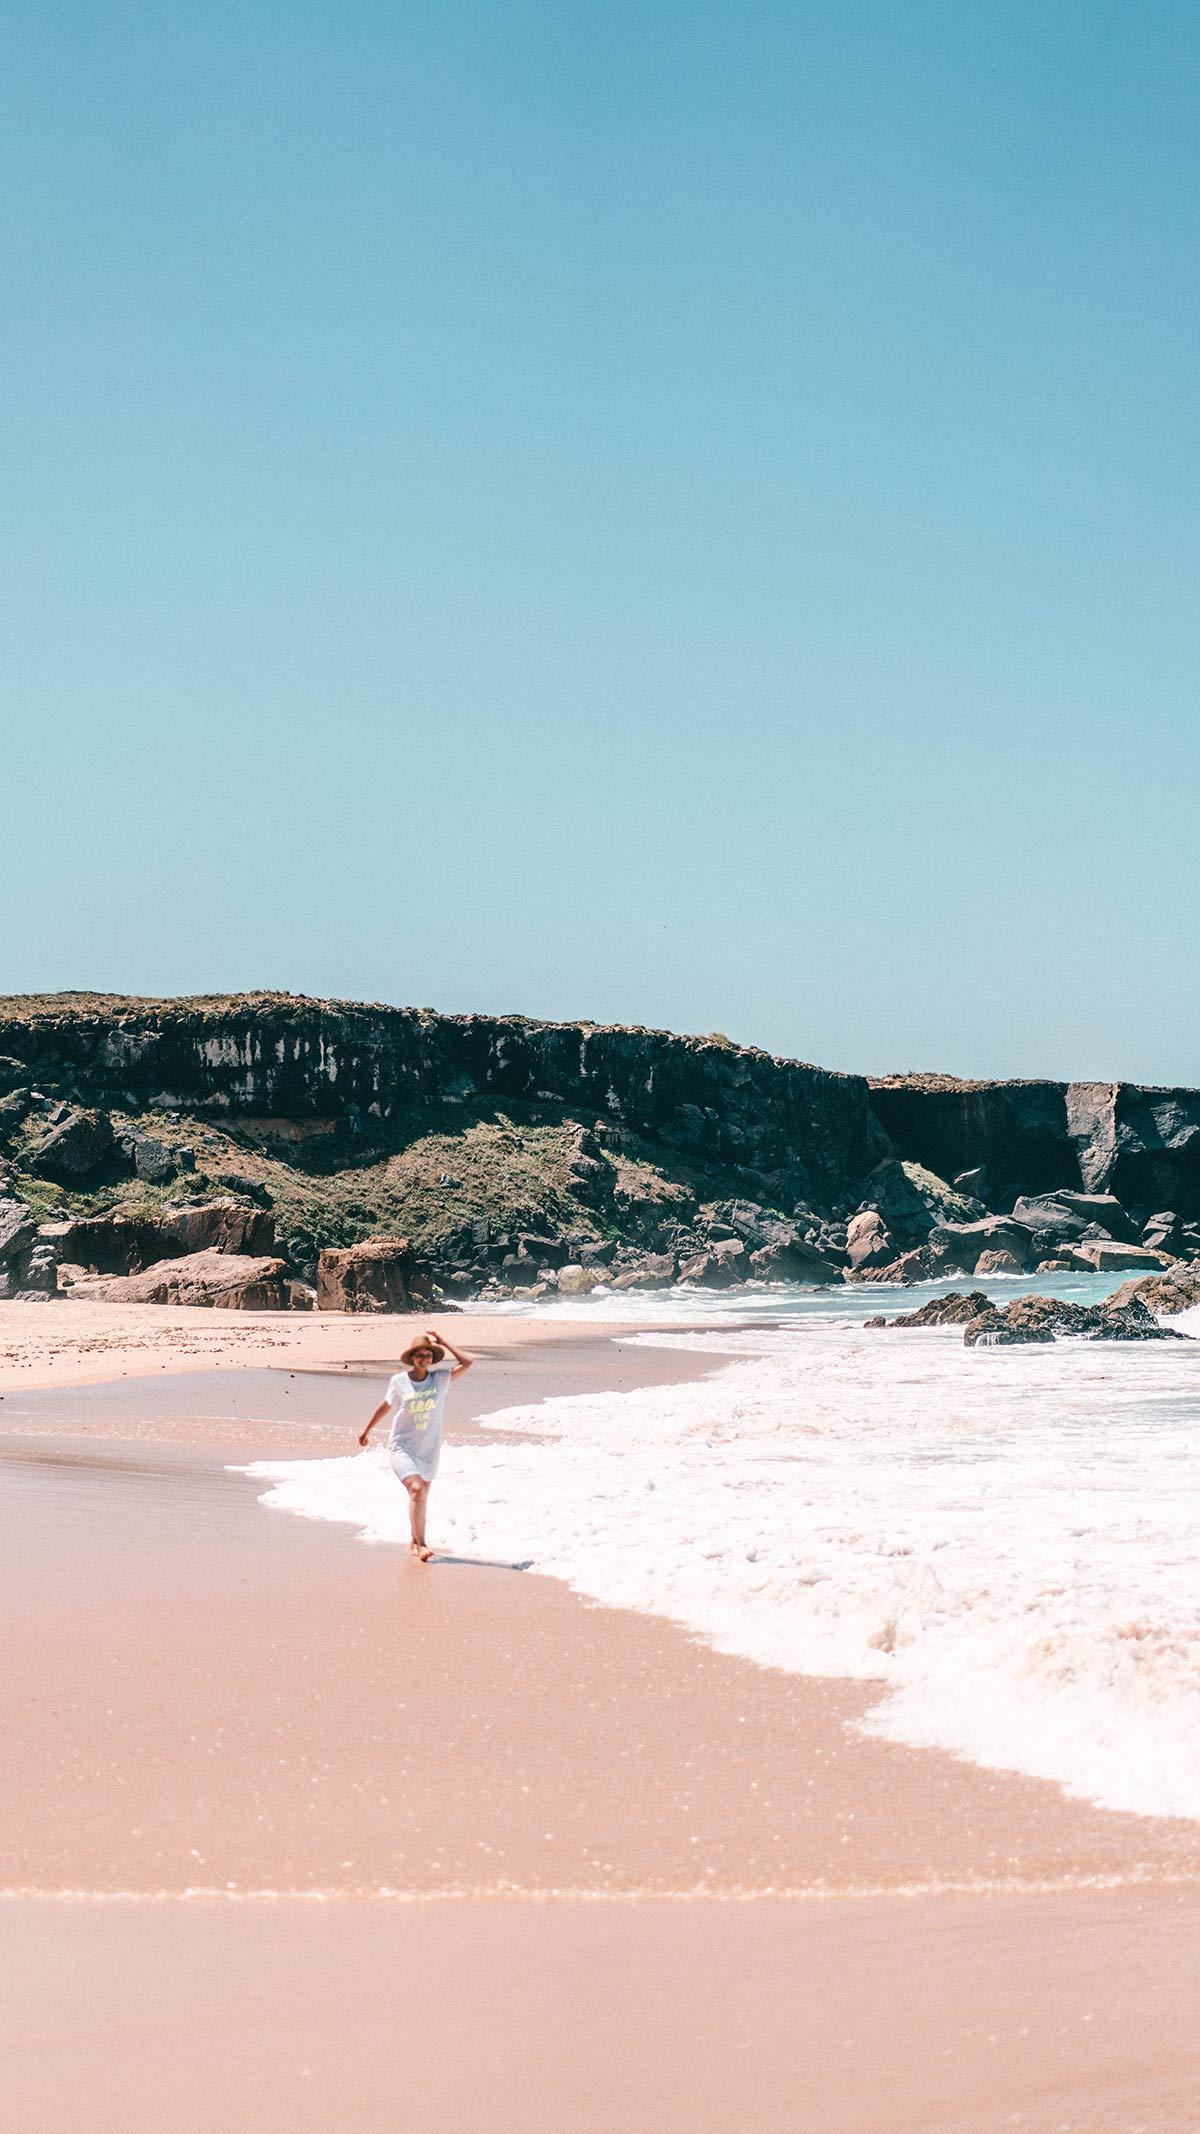 Praia do Malhao in Portugal